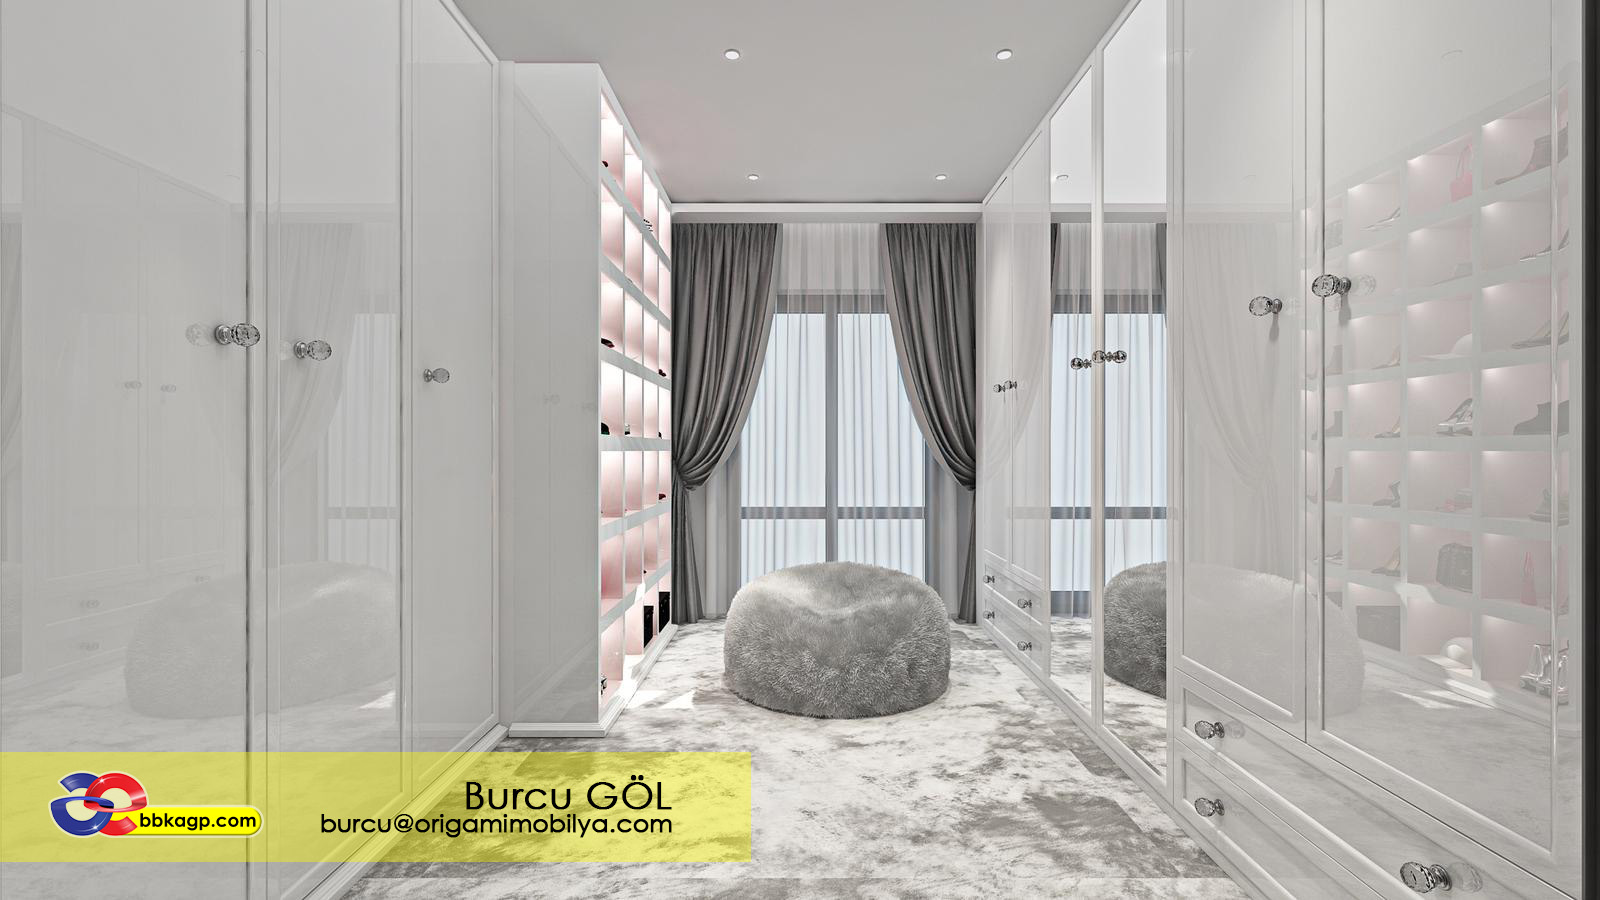 3D mobilya modelleme Ankara